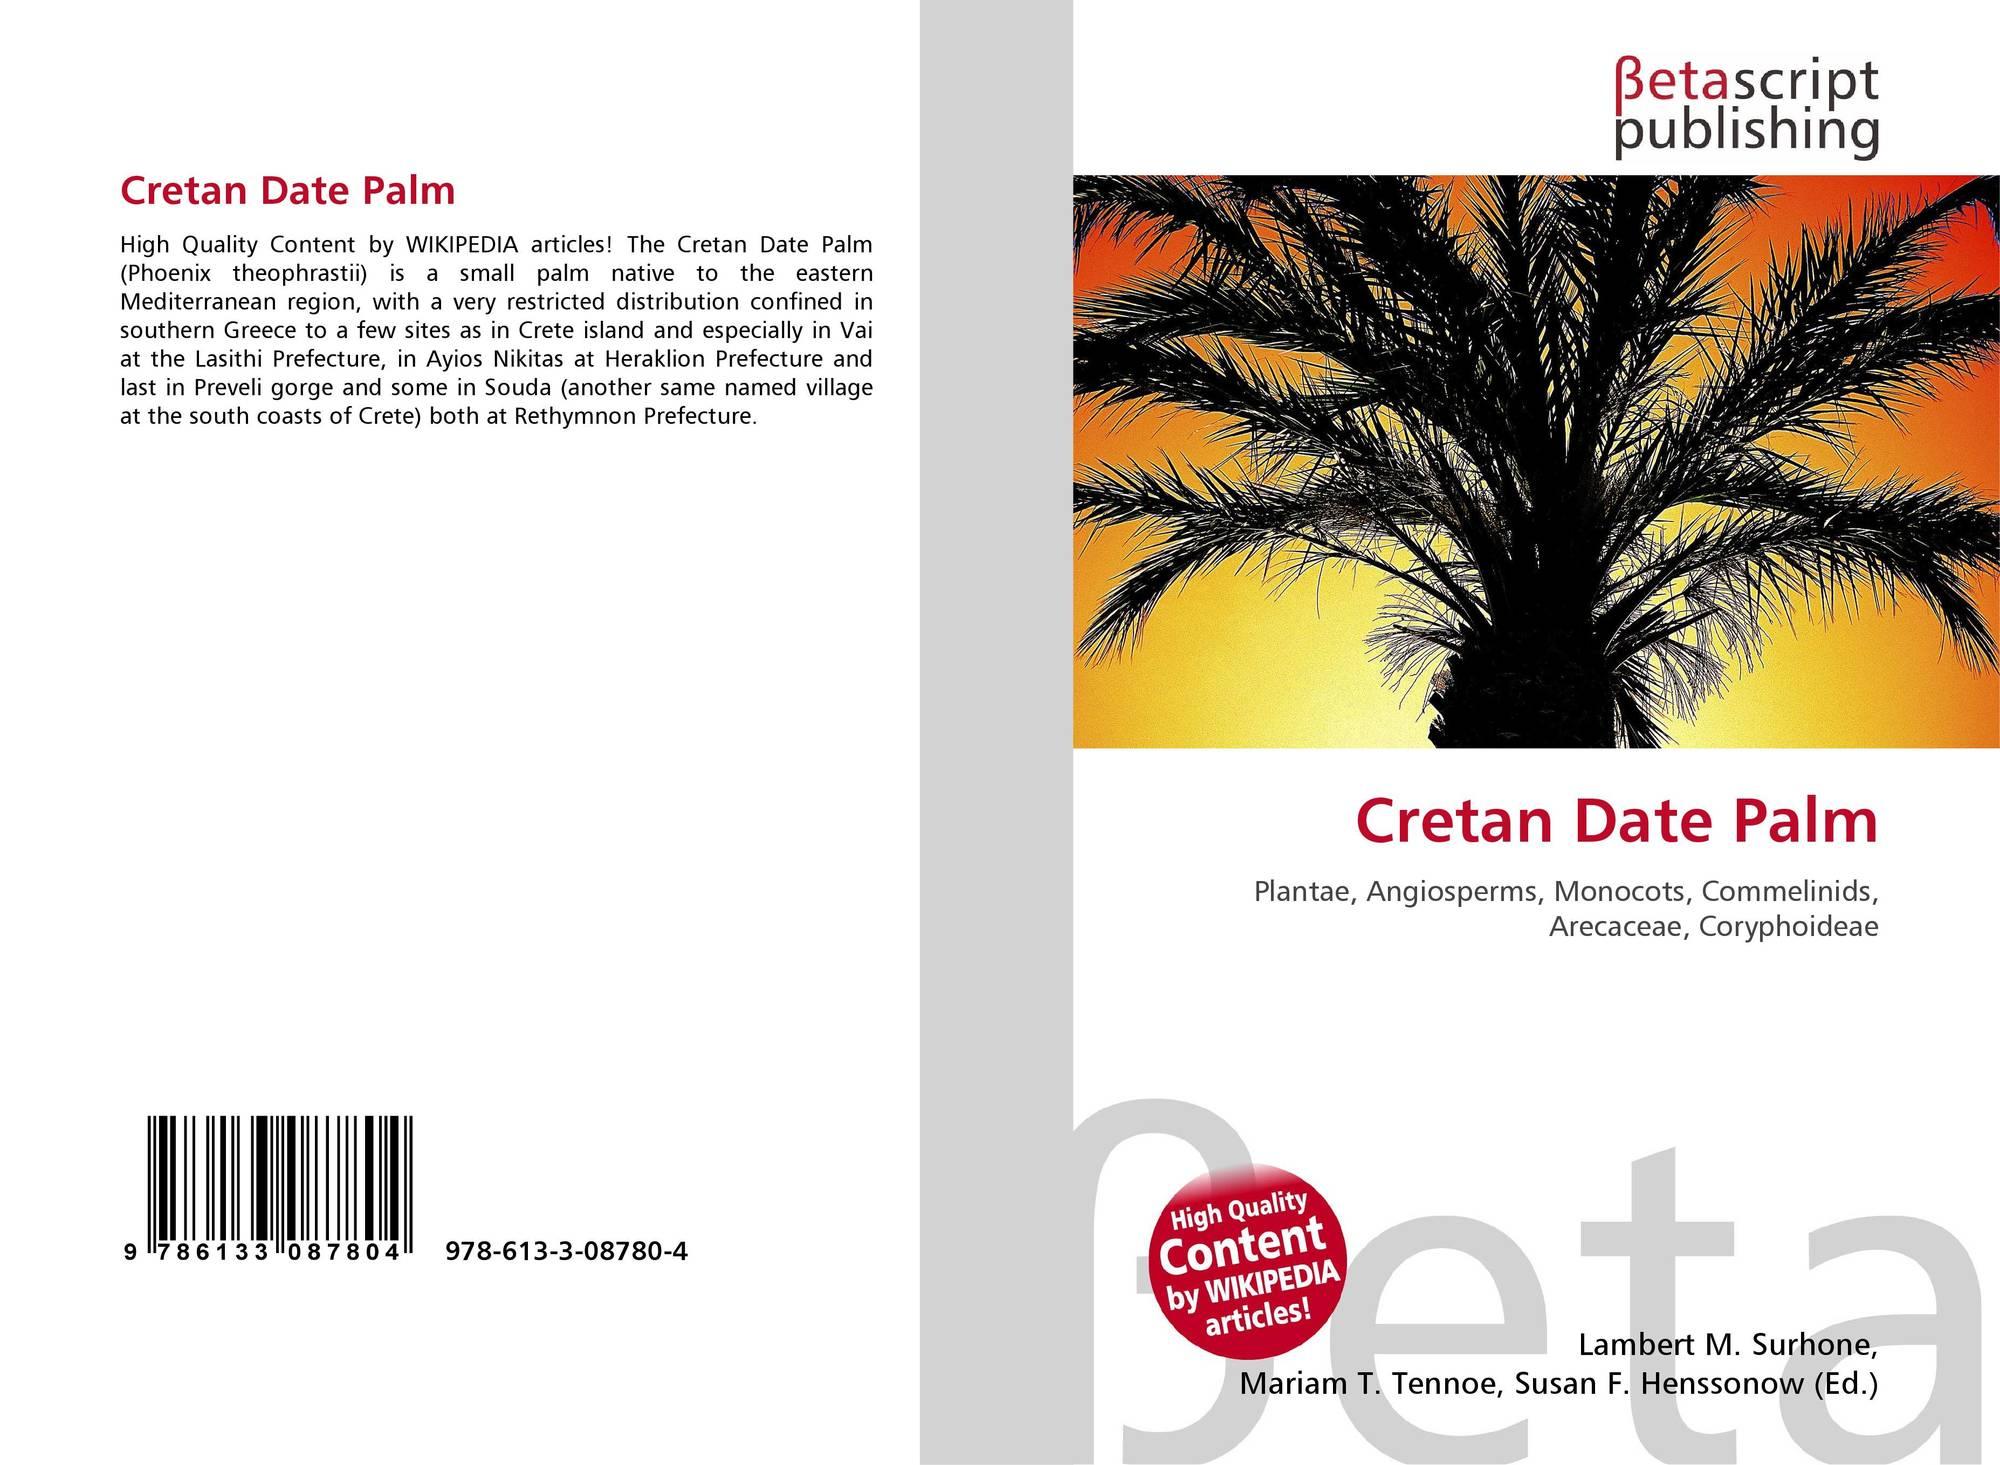 Cretan Date Palm, 978-613-3-08780-4, 6133087803 ,9786133087804